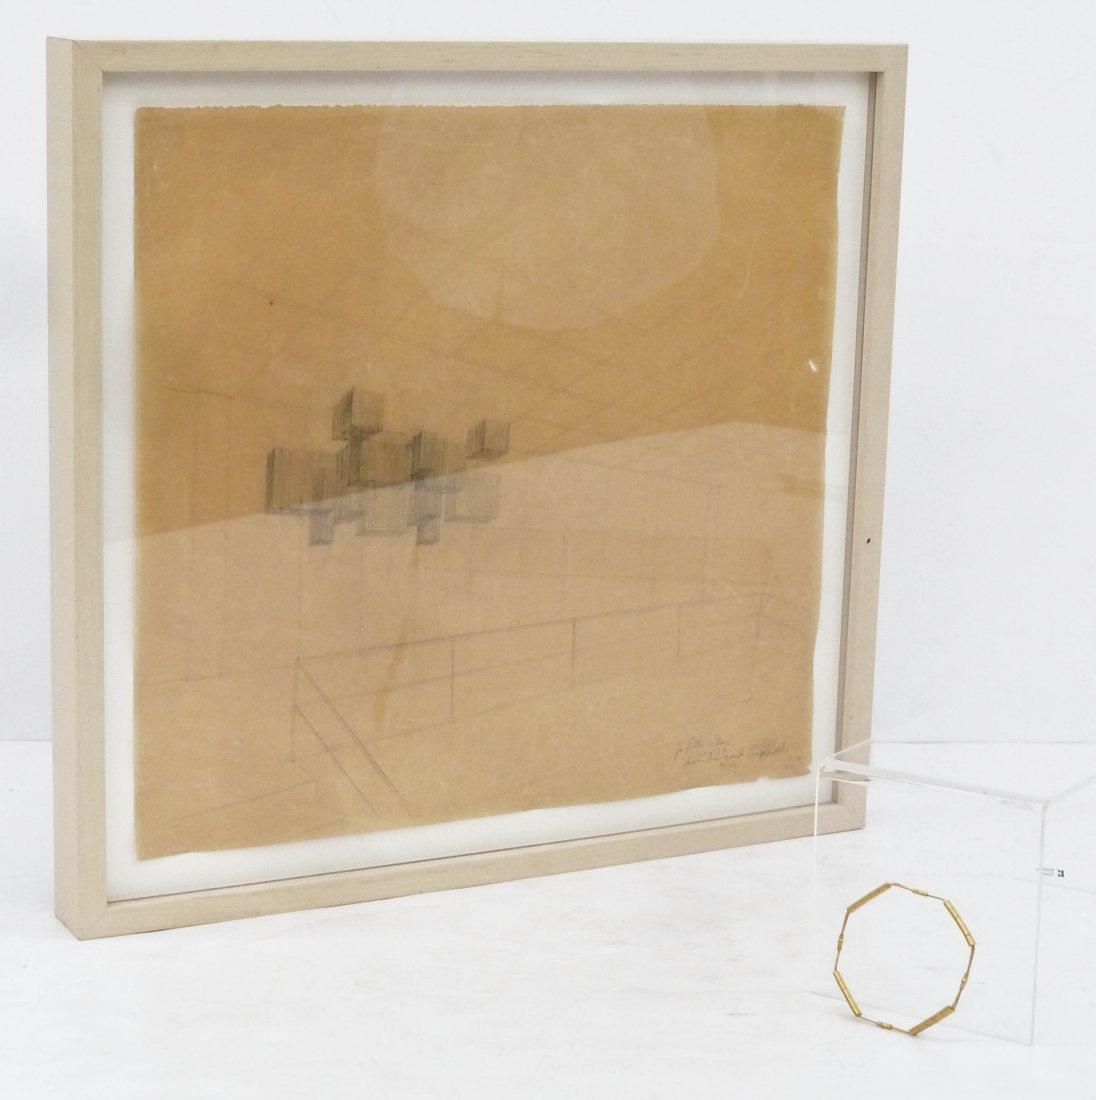 2pc Richard Lippold (1915-2002 American) Gold Wire